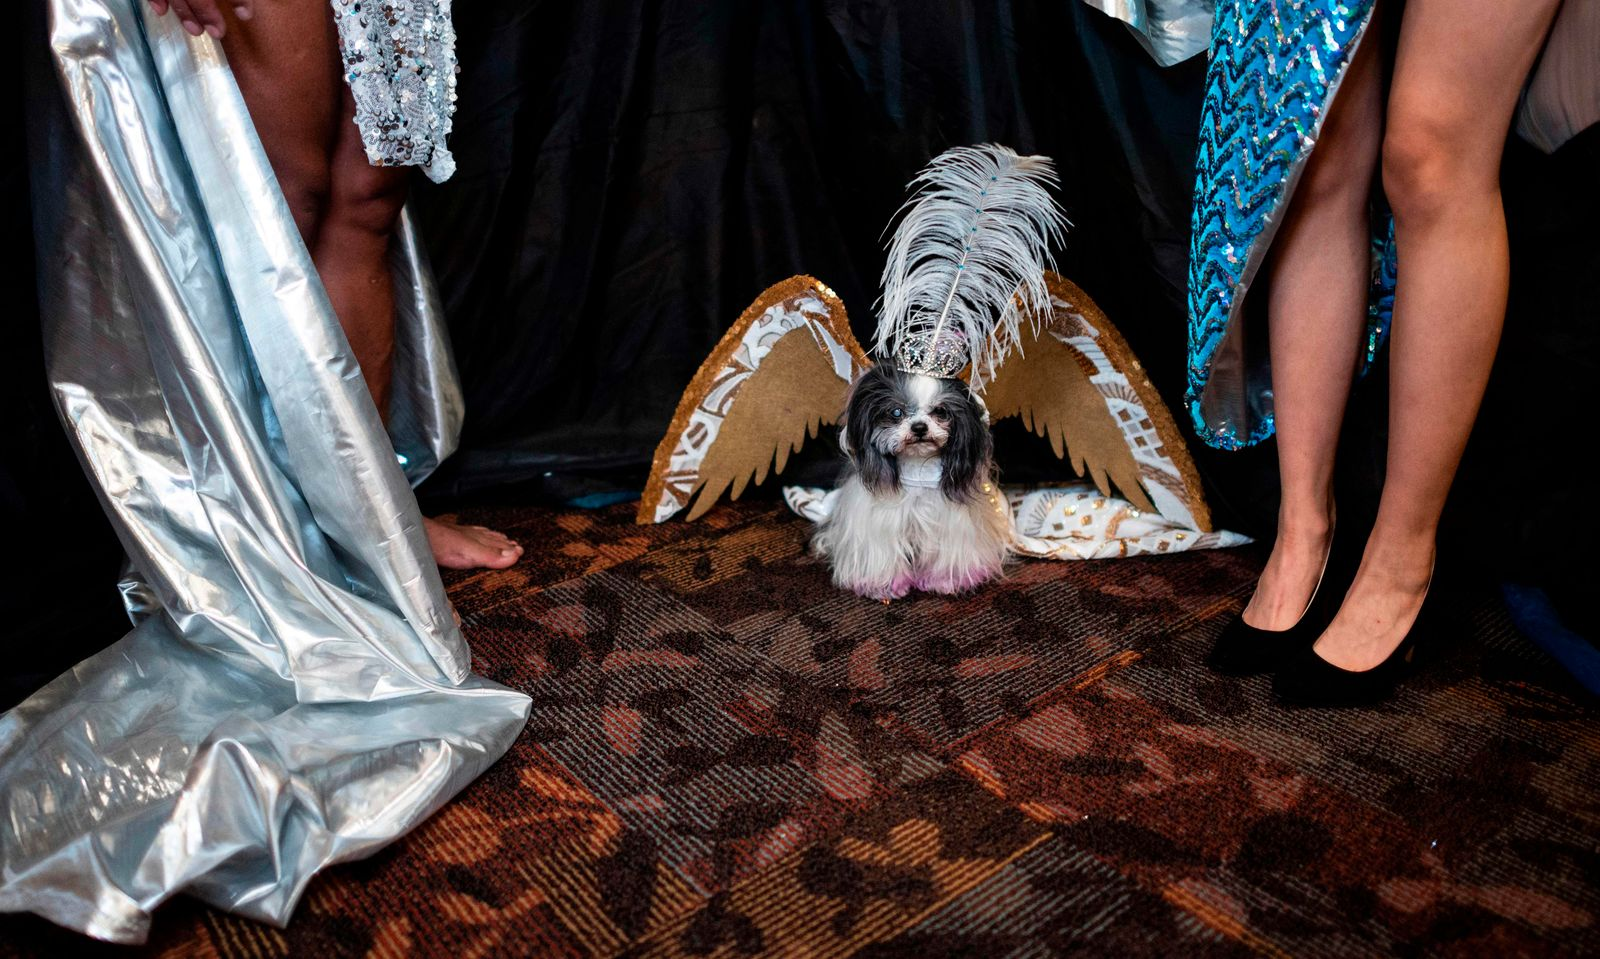 US-ANIMALS-DOG-FASHION-OFFBEAT